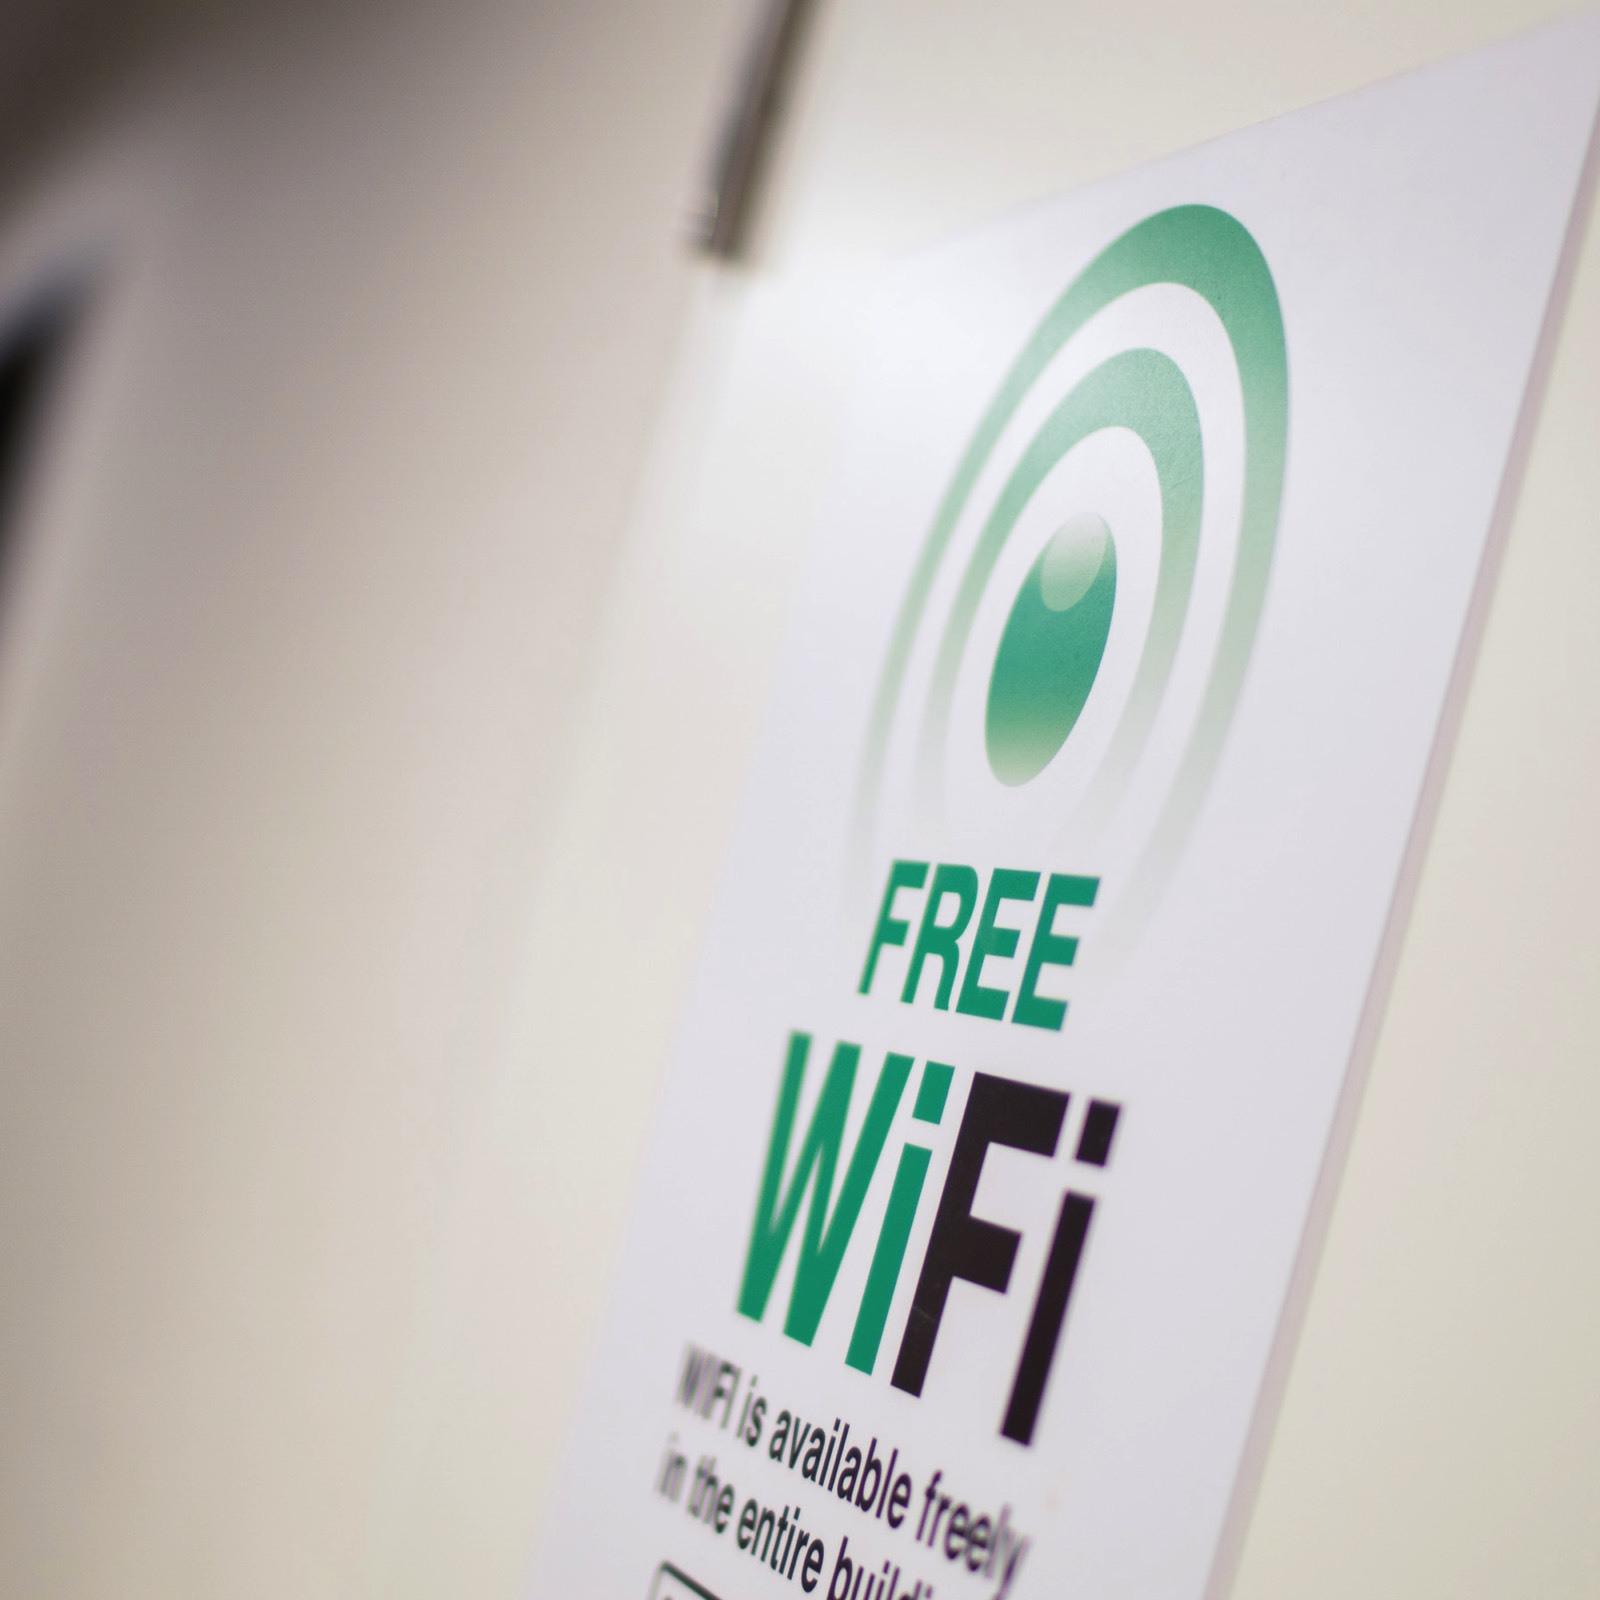 【Smart】仕事にゲームに動画視聴に!ラクラクつながる無料WiFi